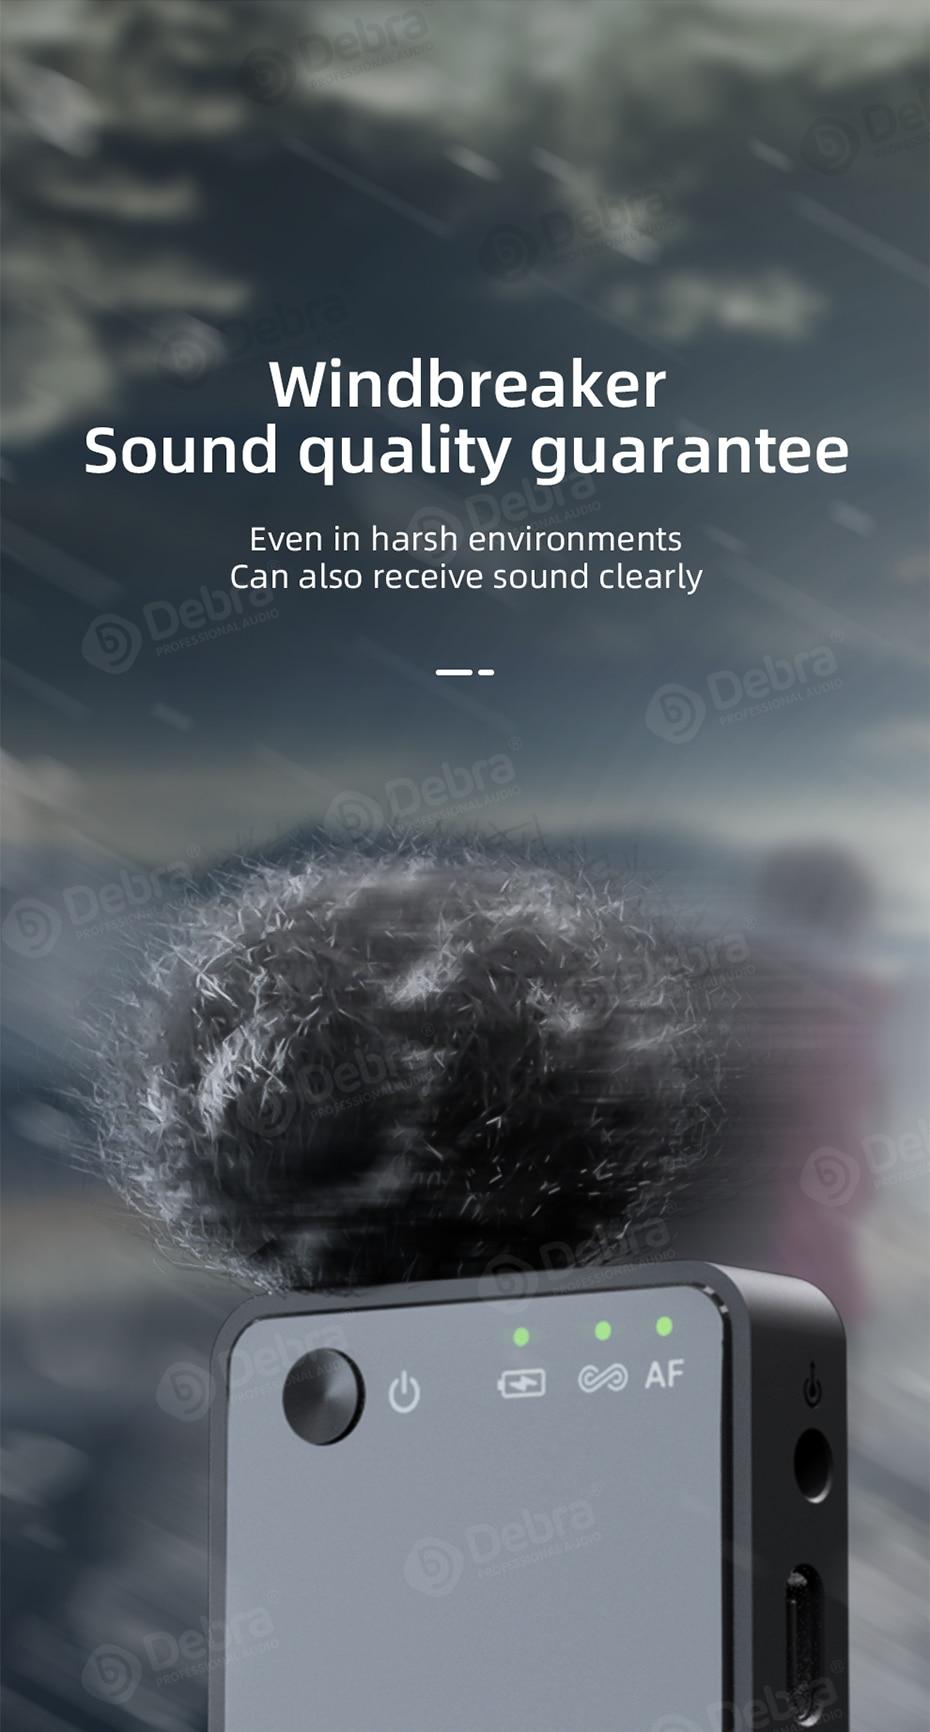 Debra GO-PROII Portable Charging Wireless Lavalier Microphone 100m Range For DSLR Camera Interview, Speech,Video Recording. enlarge